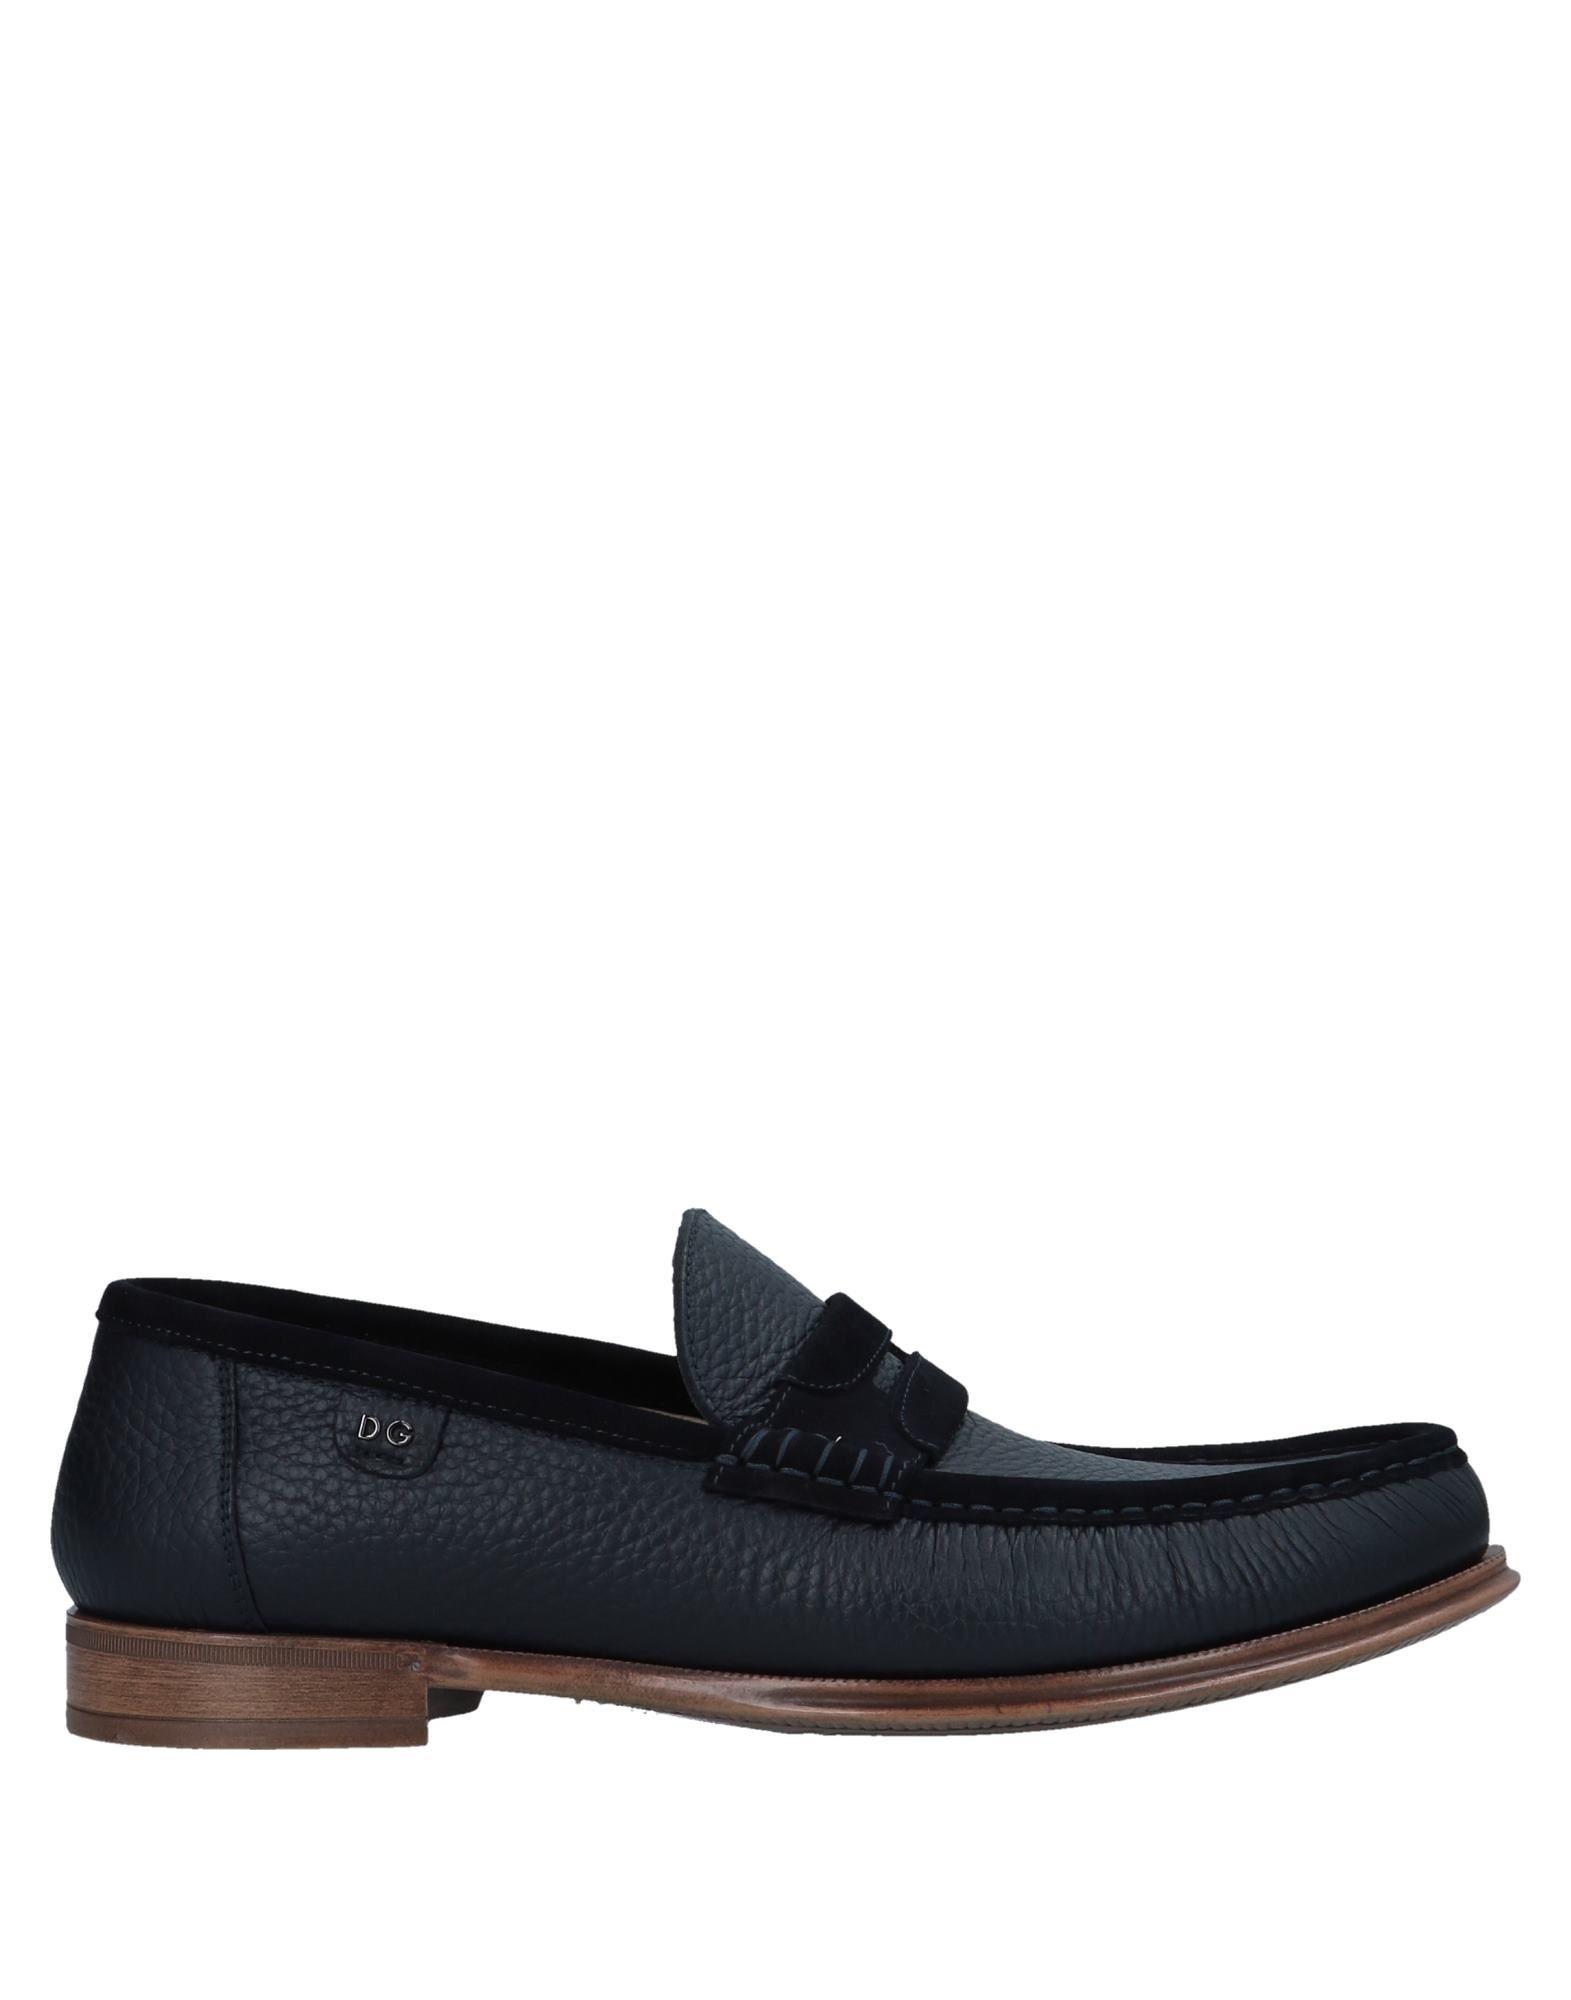 Dolce & Gabbana Mokassins Herren  11508252WG Gute Qualität beliebte Schuhe